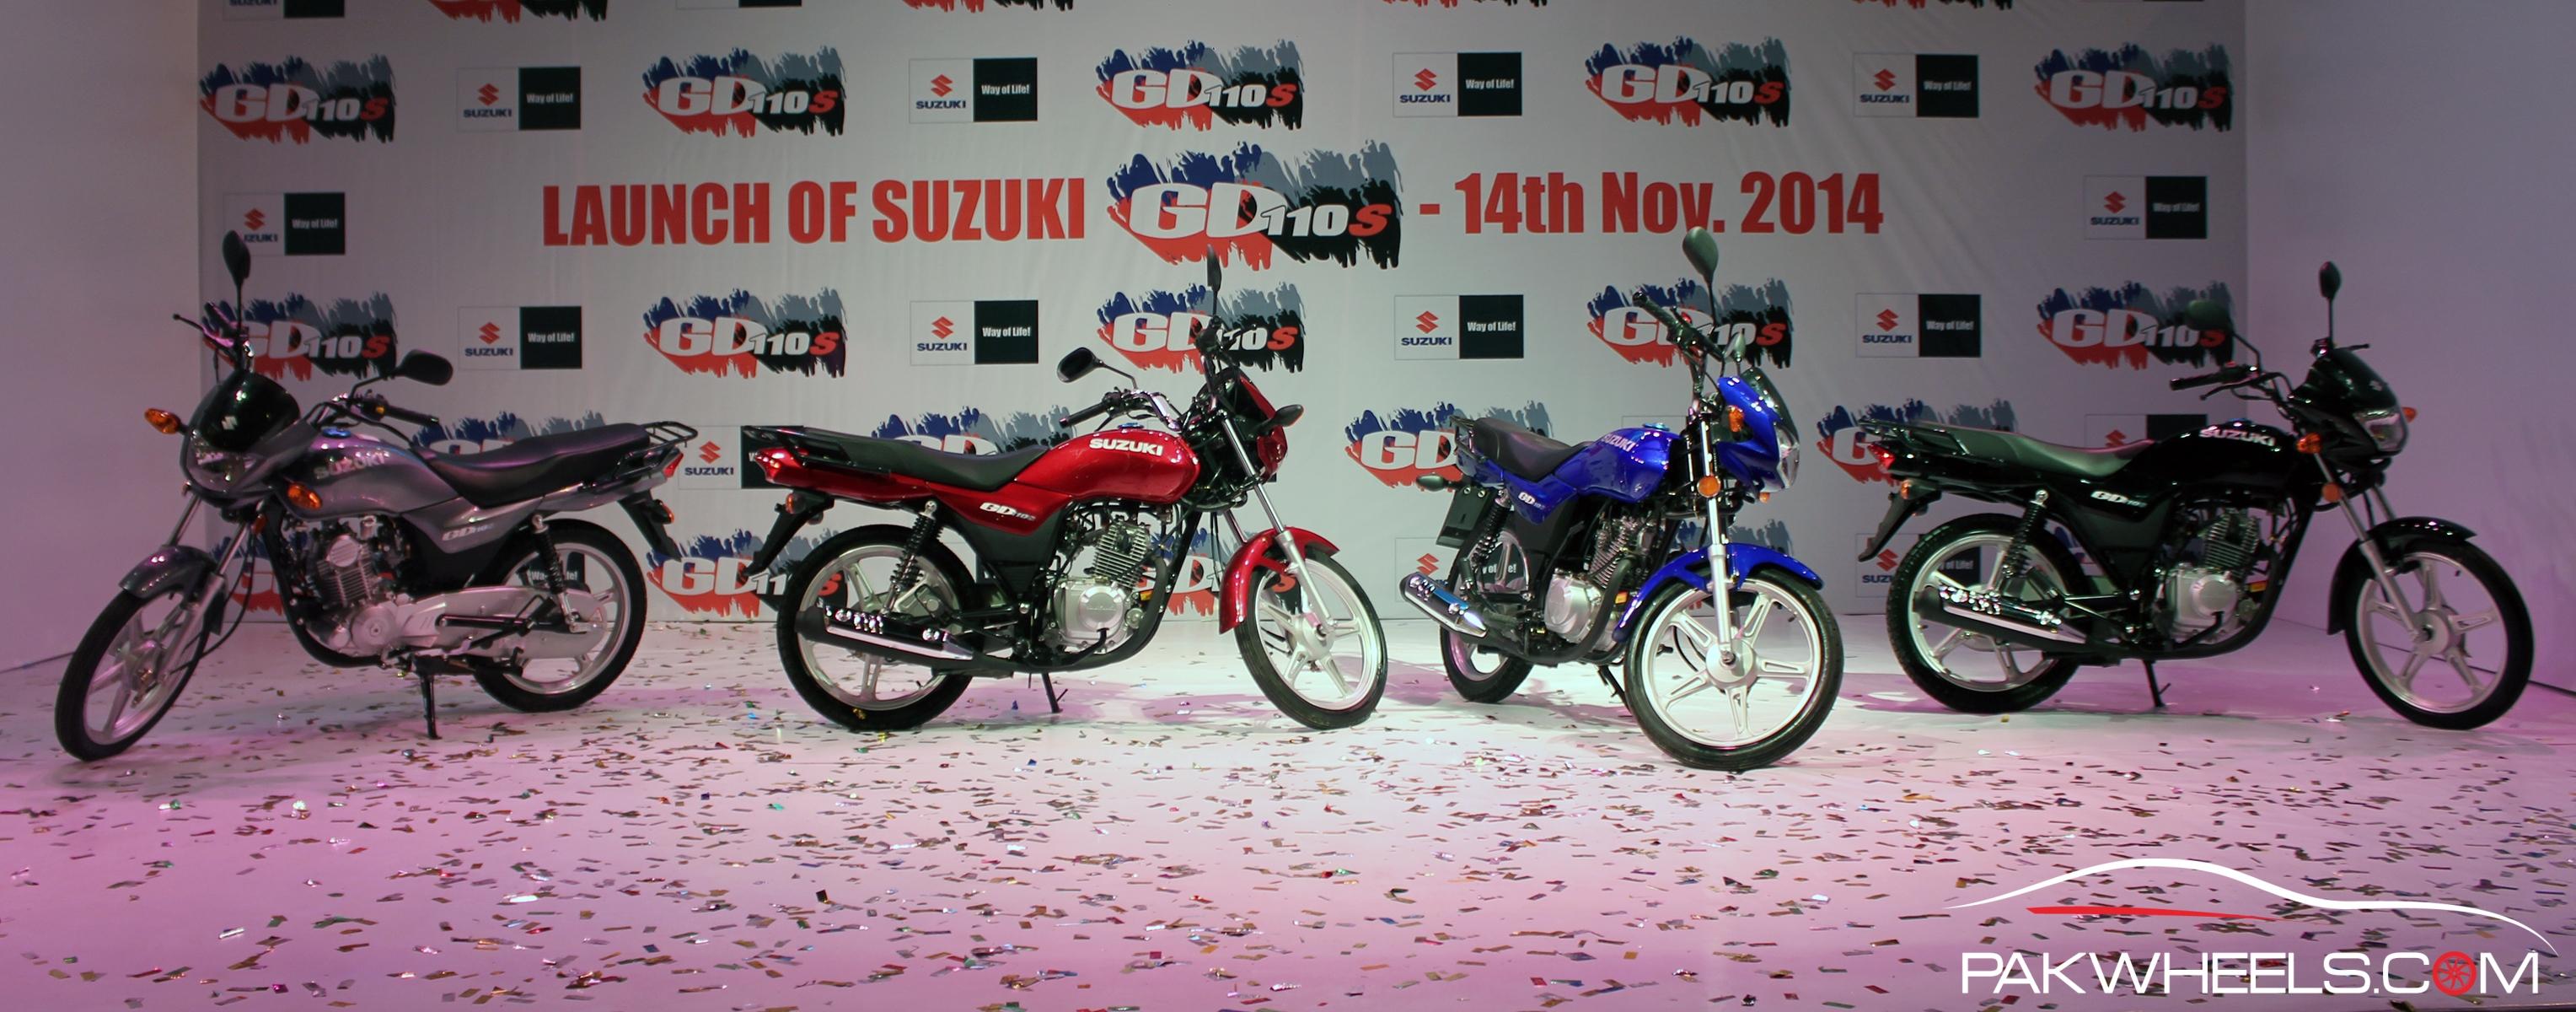 Suzuki GD110S Pakistan  (9)